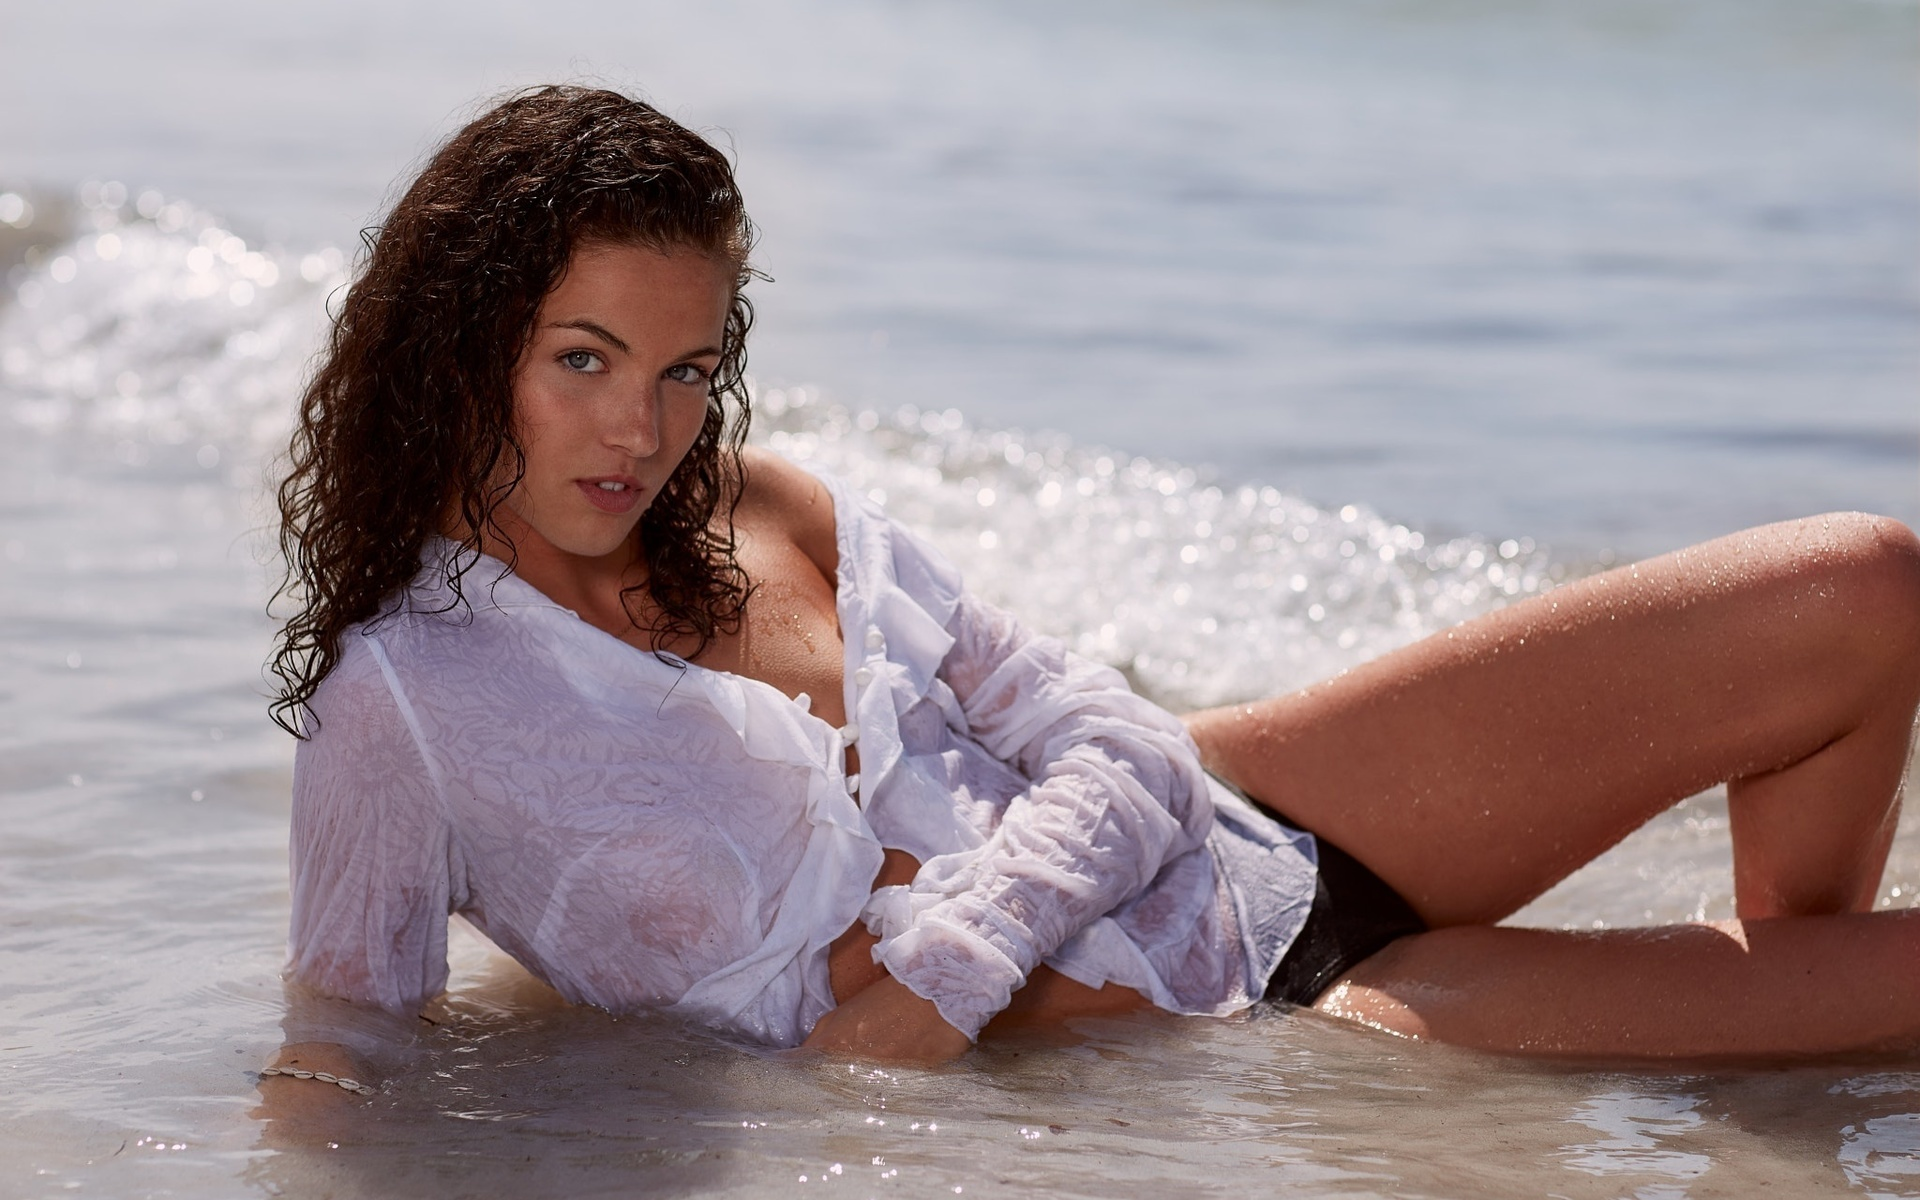 фото девушки в мокрой блузке - 9